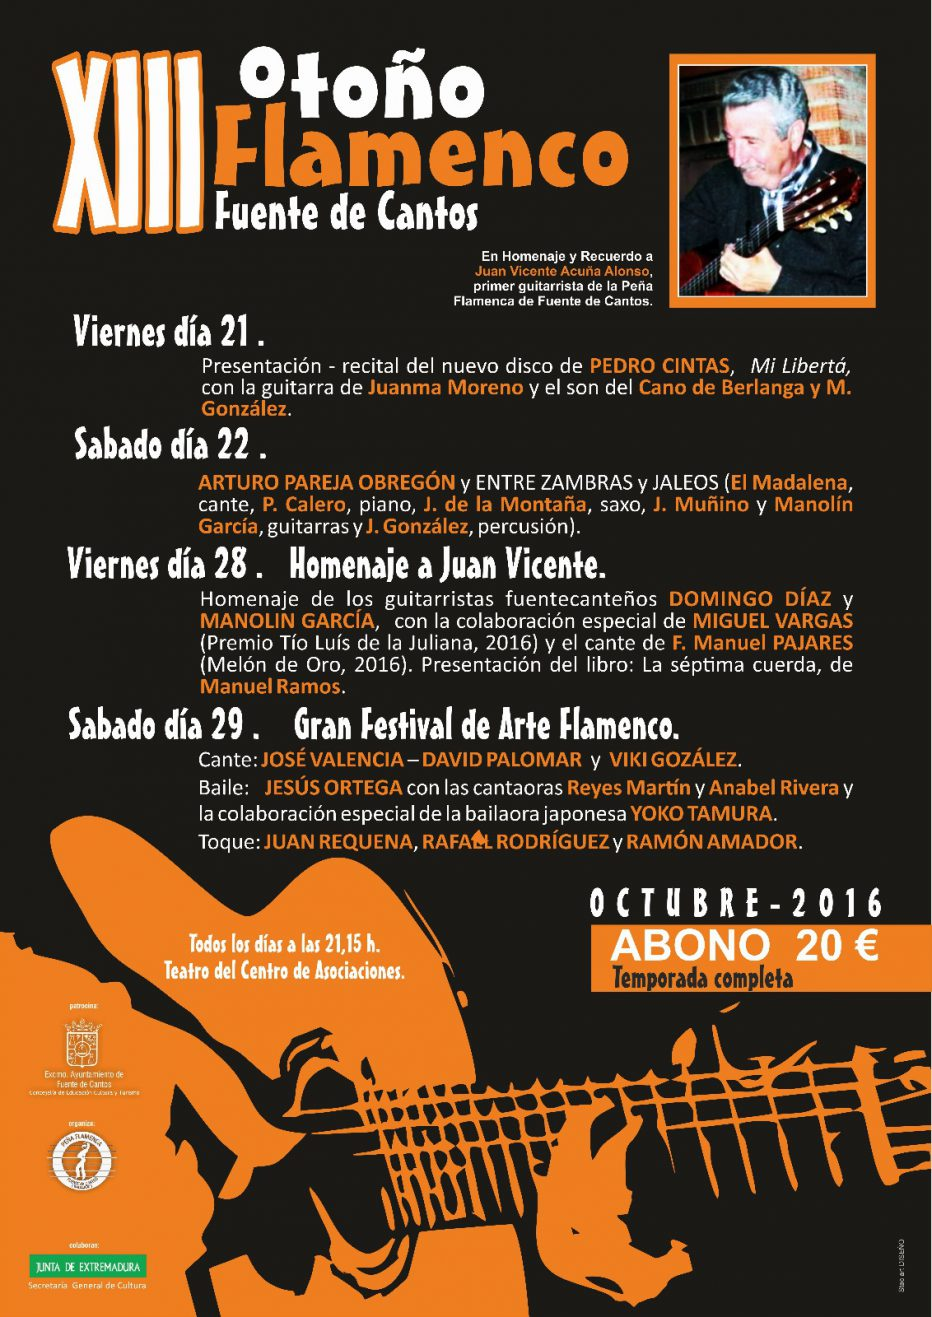 Otoño Flamenco 2016